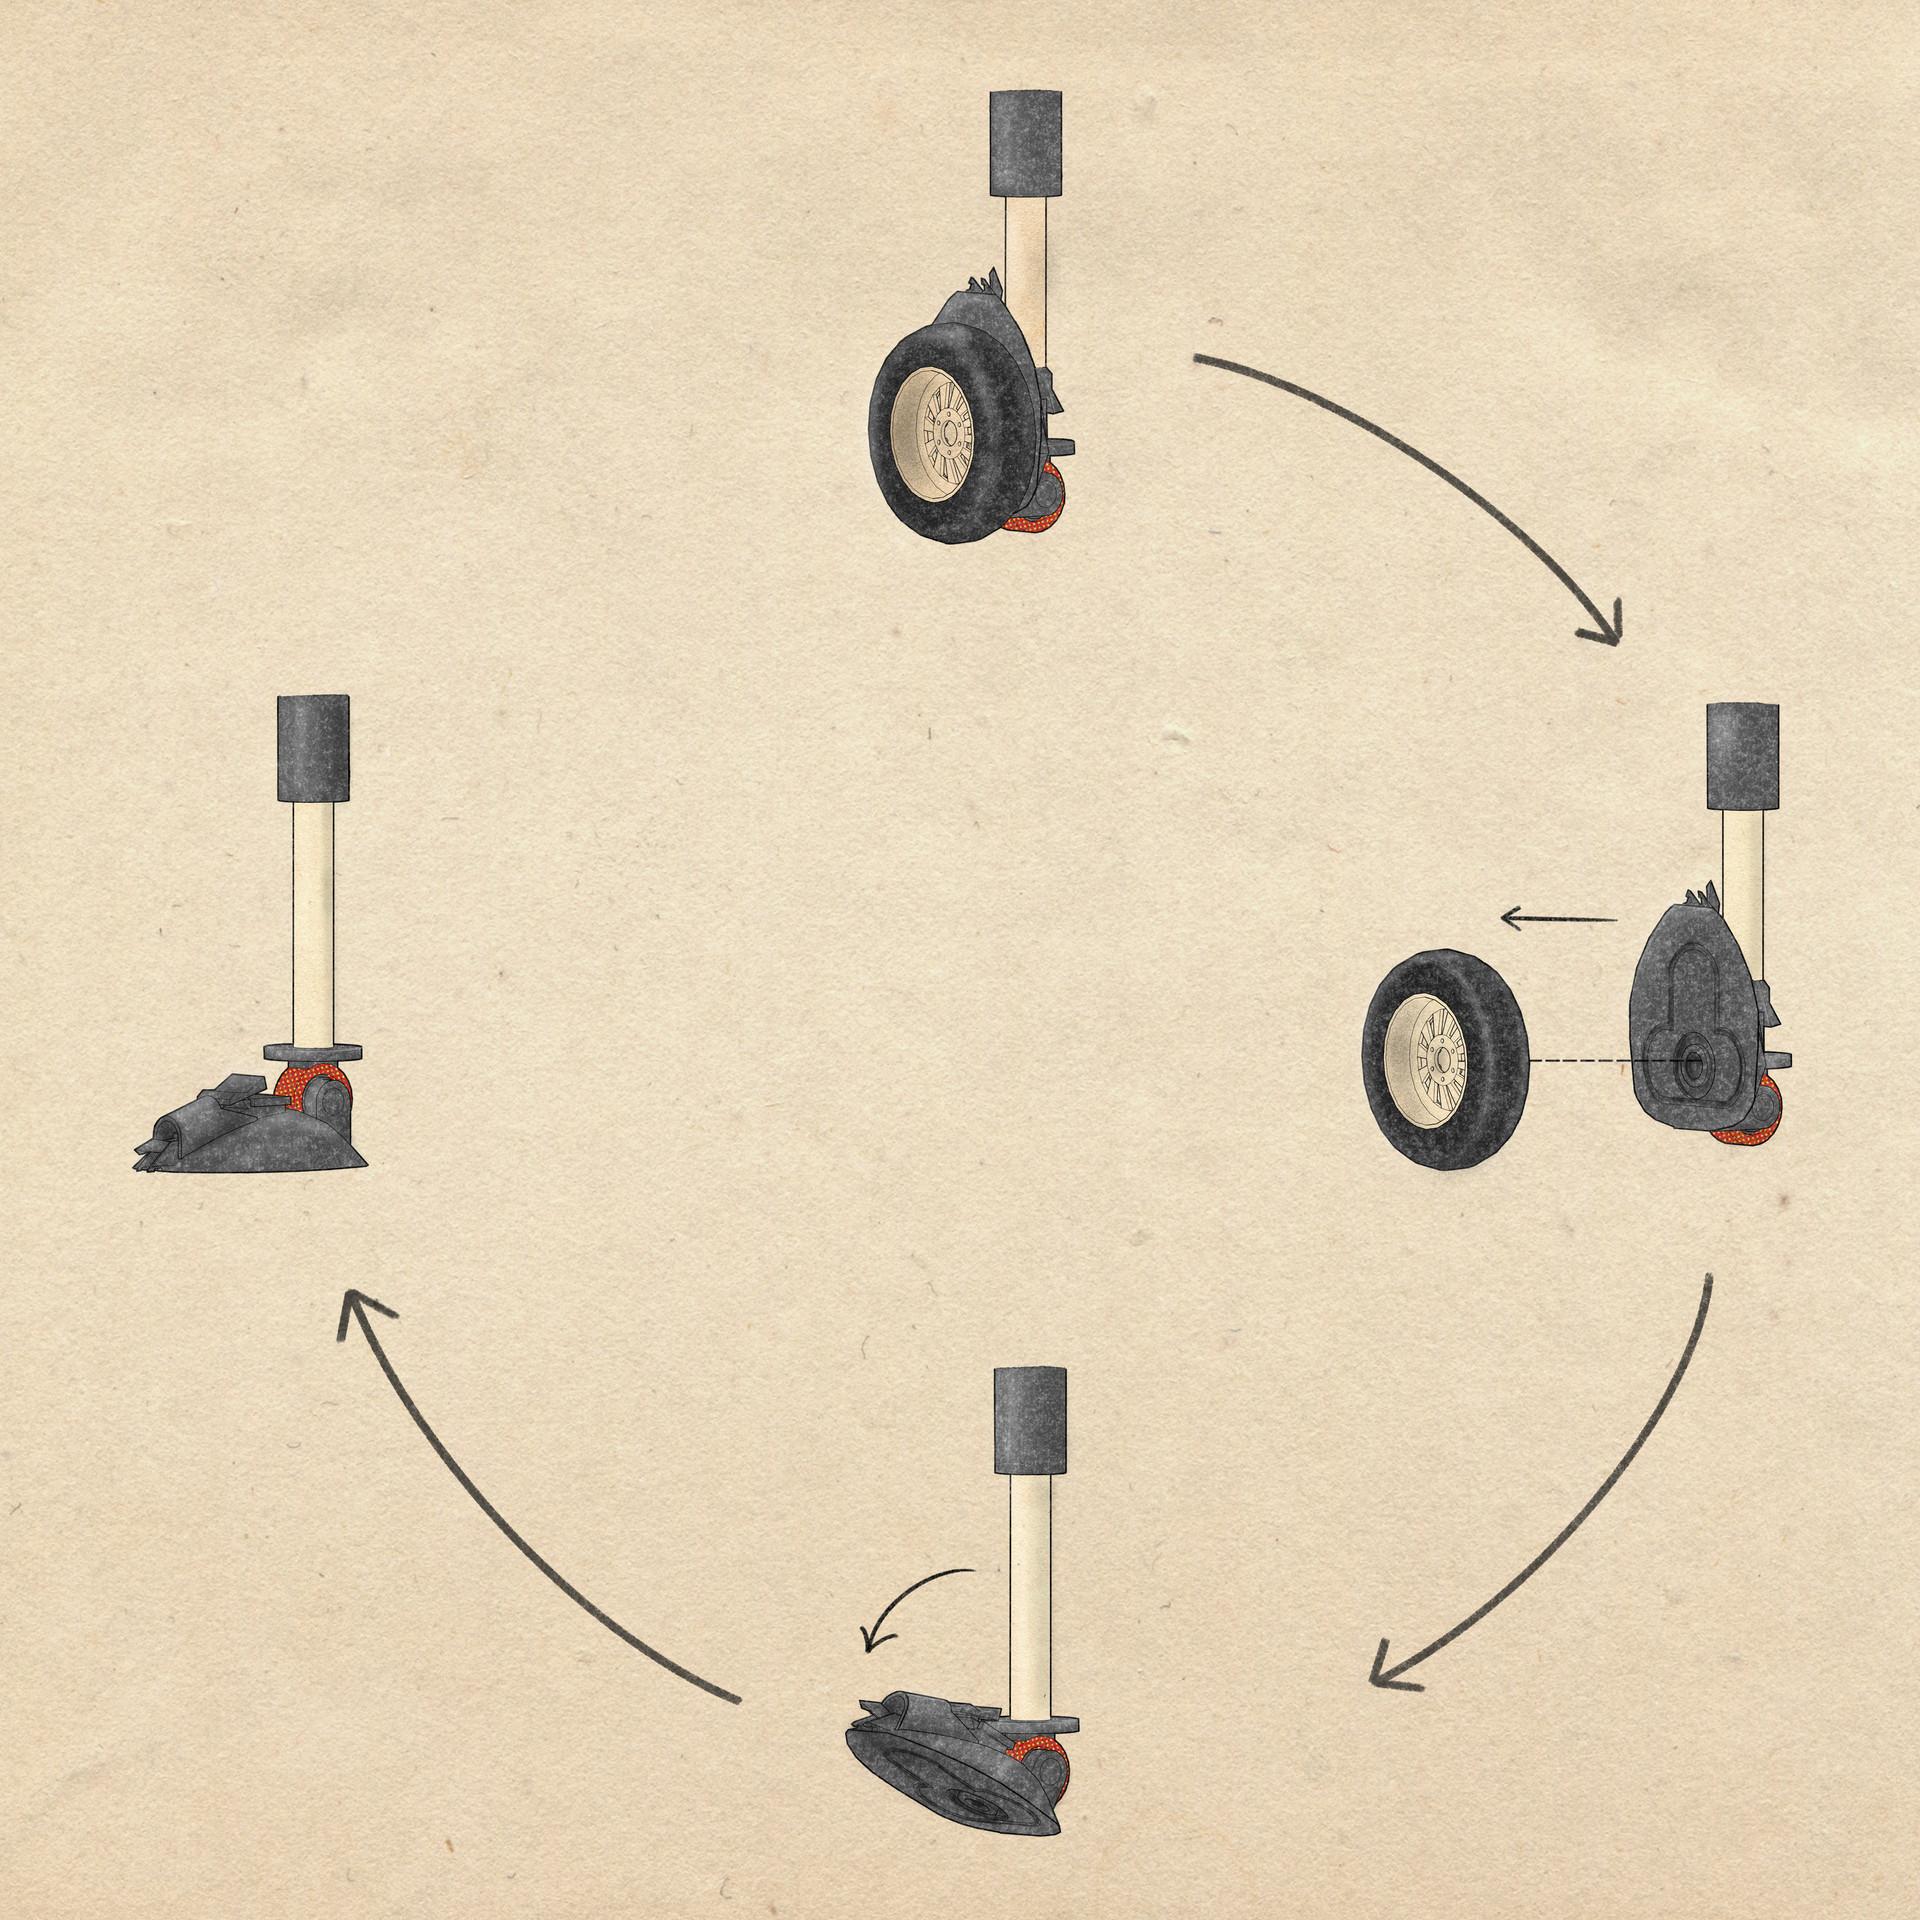 Detach Wheel - Fold Down Foot